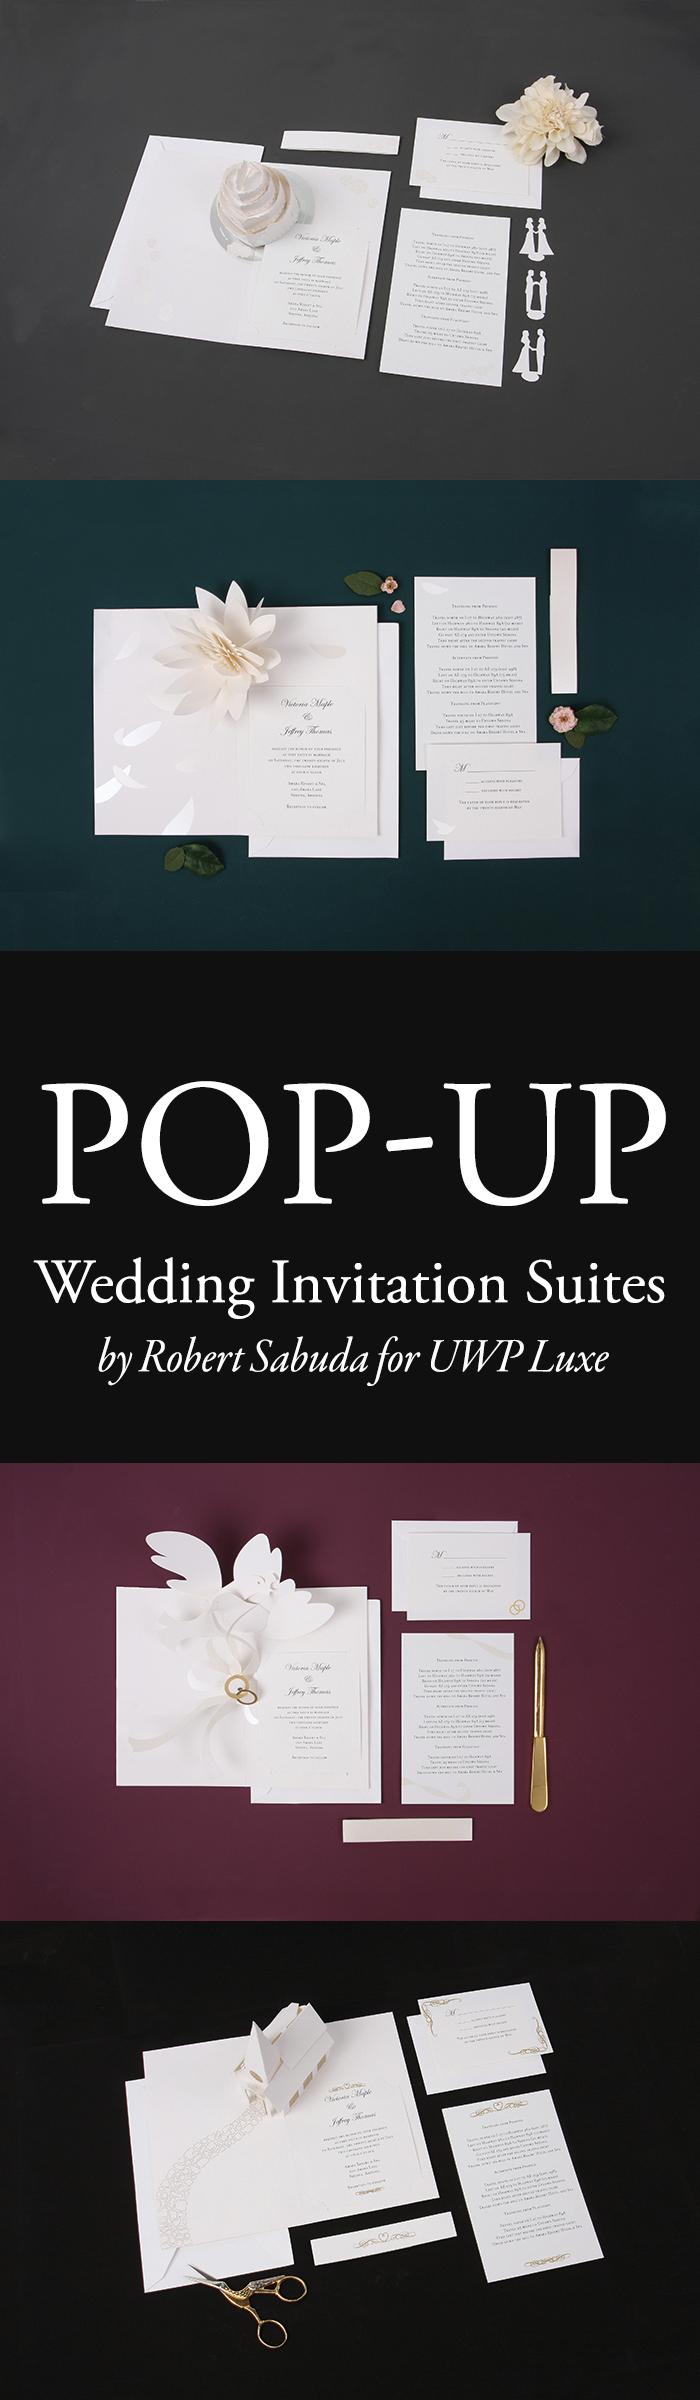 wedding invitations Wedding Blog Posts - Archives | Junebug Weddings